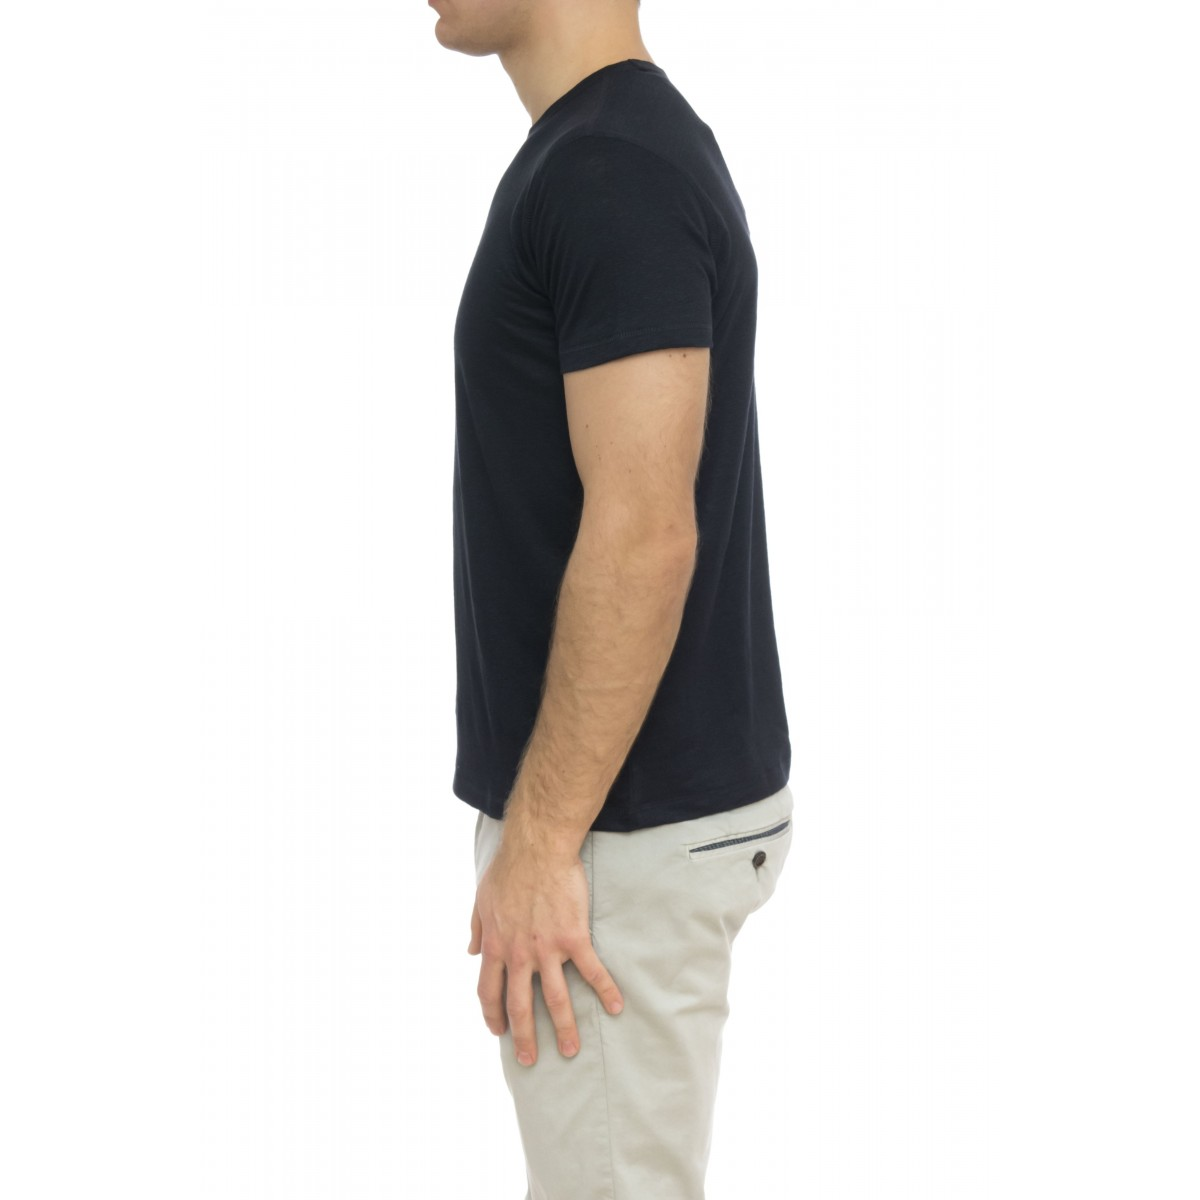 T-shirt uomo - J503 hts040 t-shirt lino